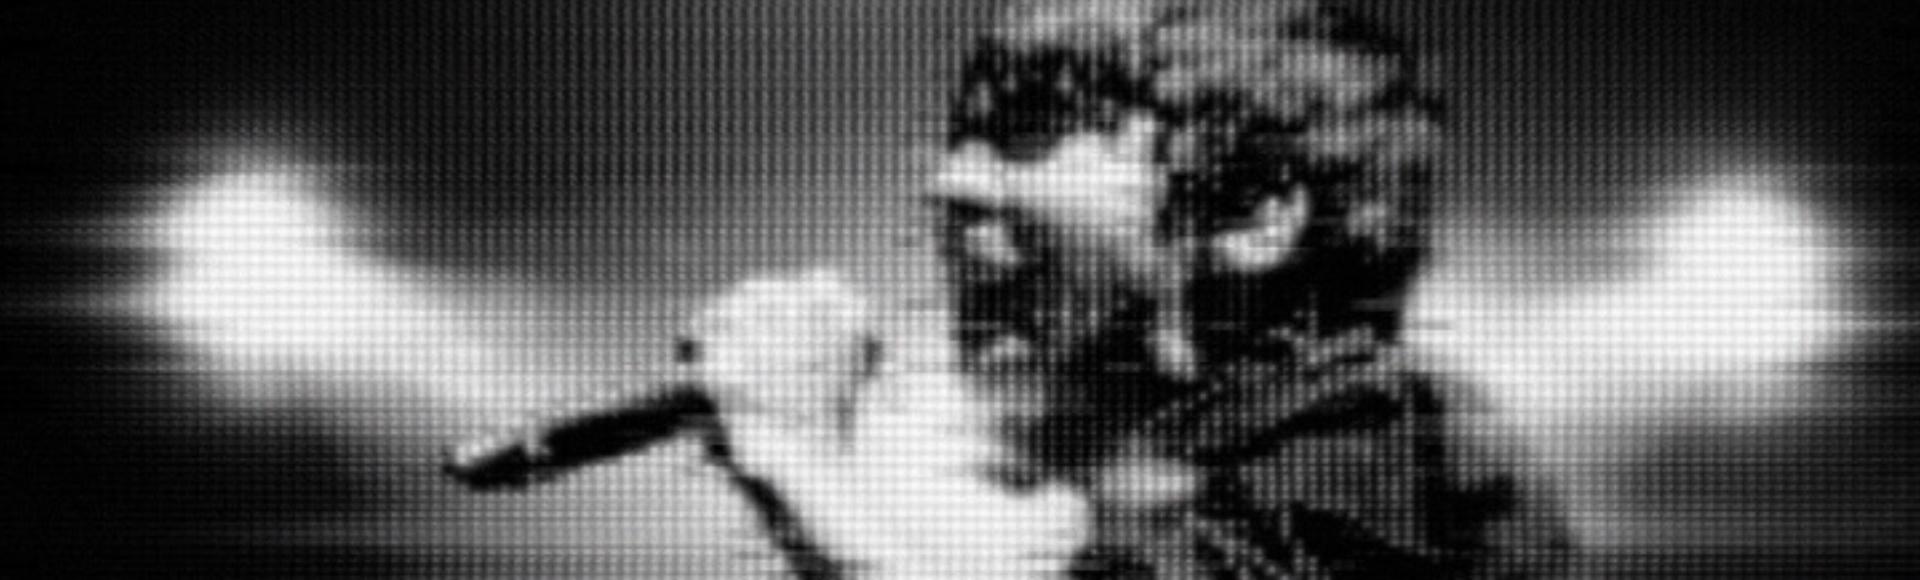 LP_Tsuns (0-00-00-05)_jpgm.jpg